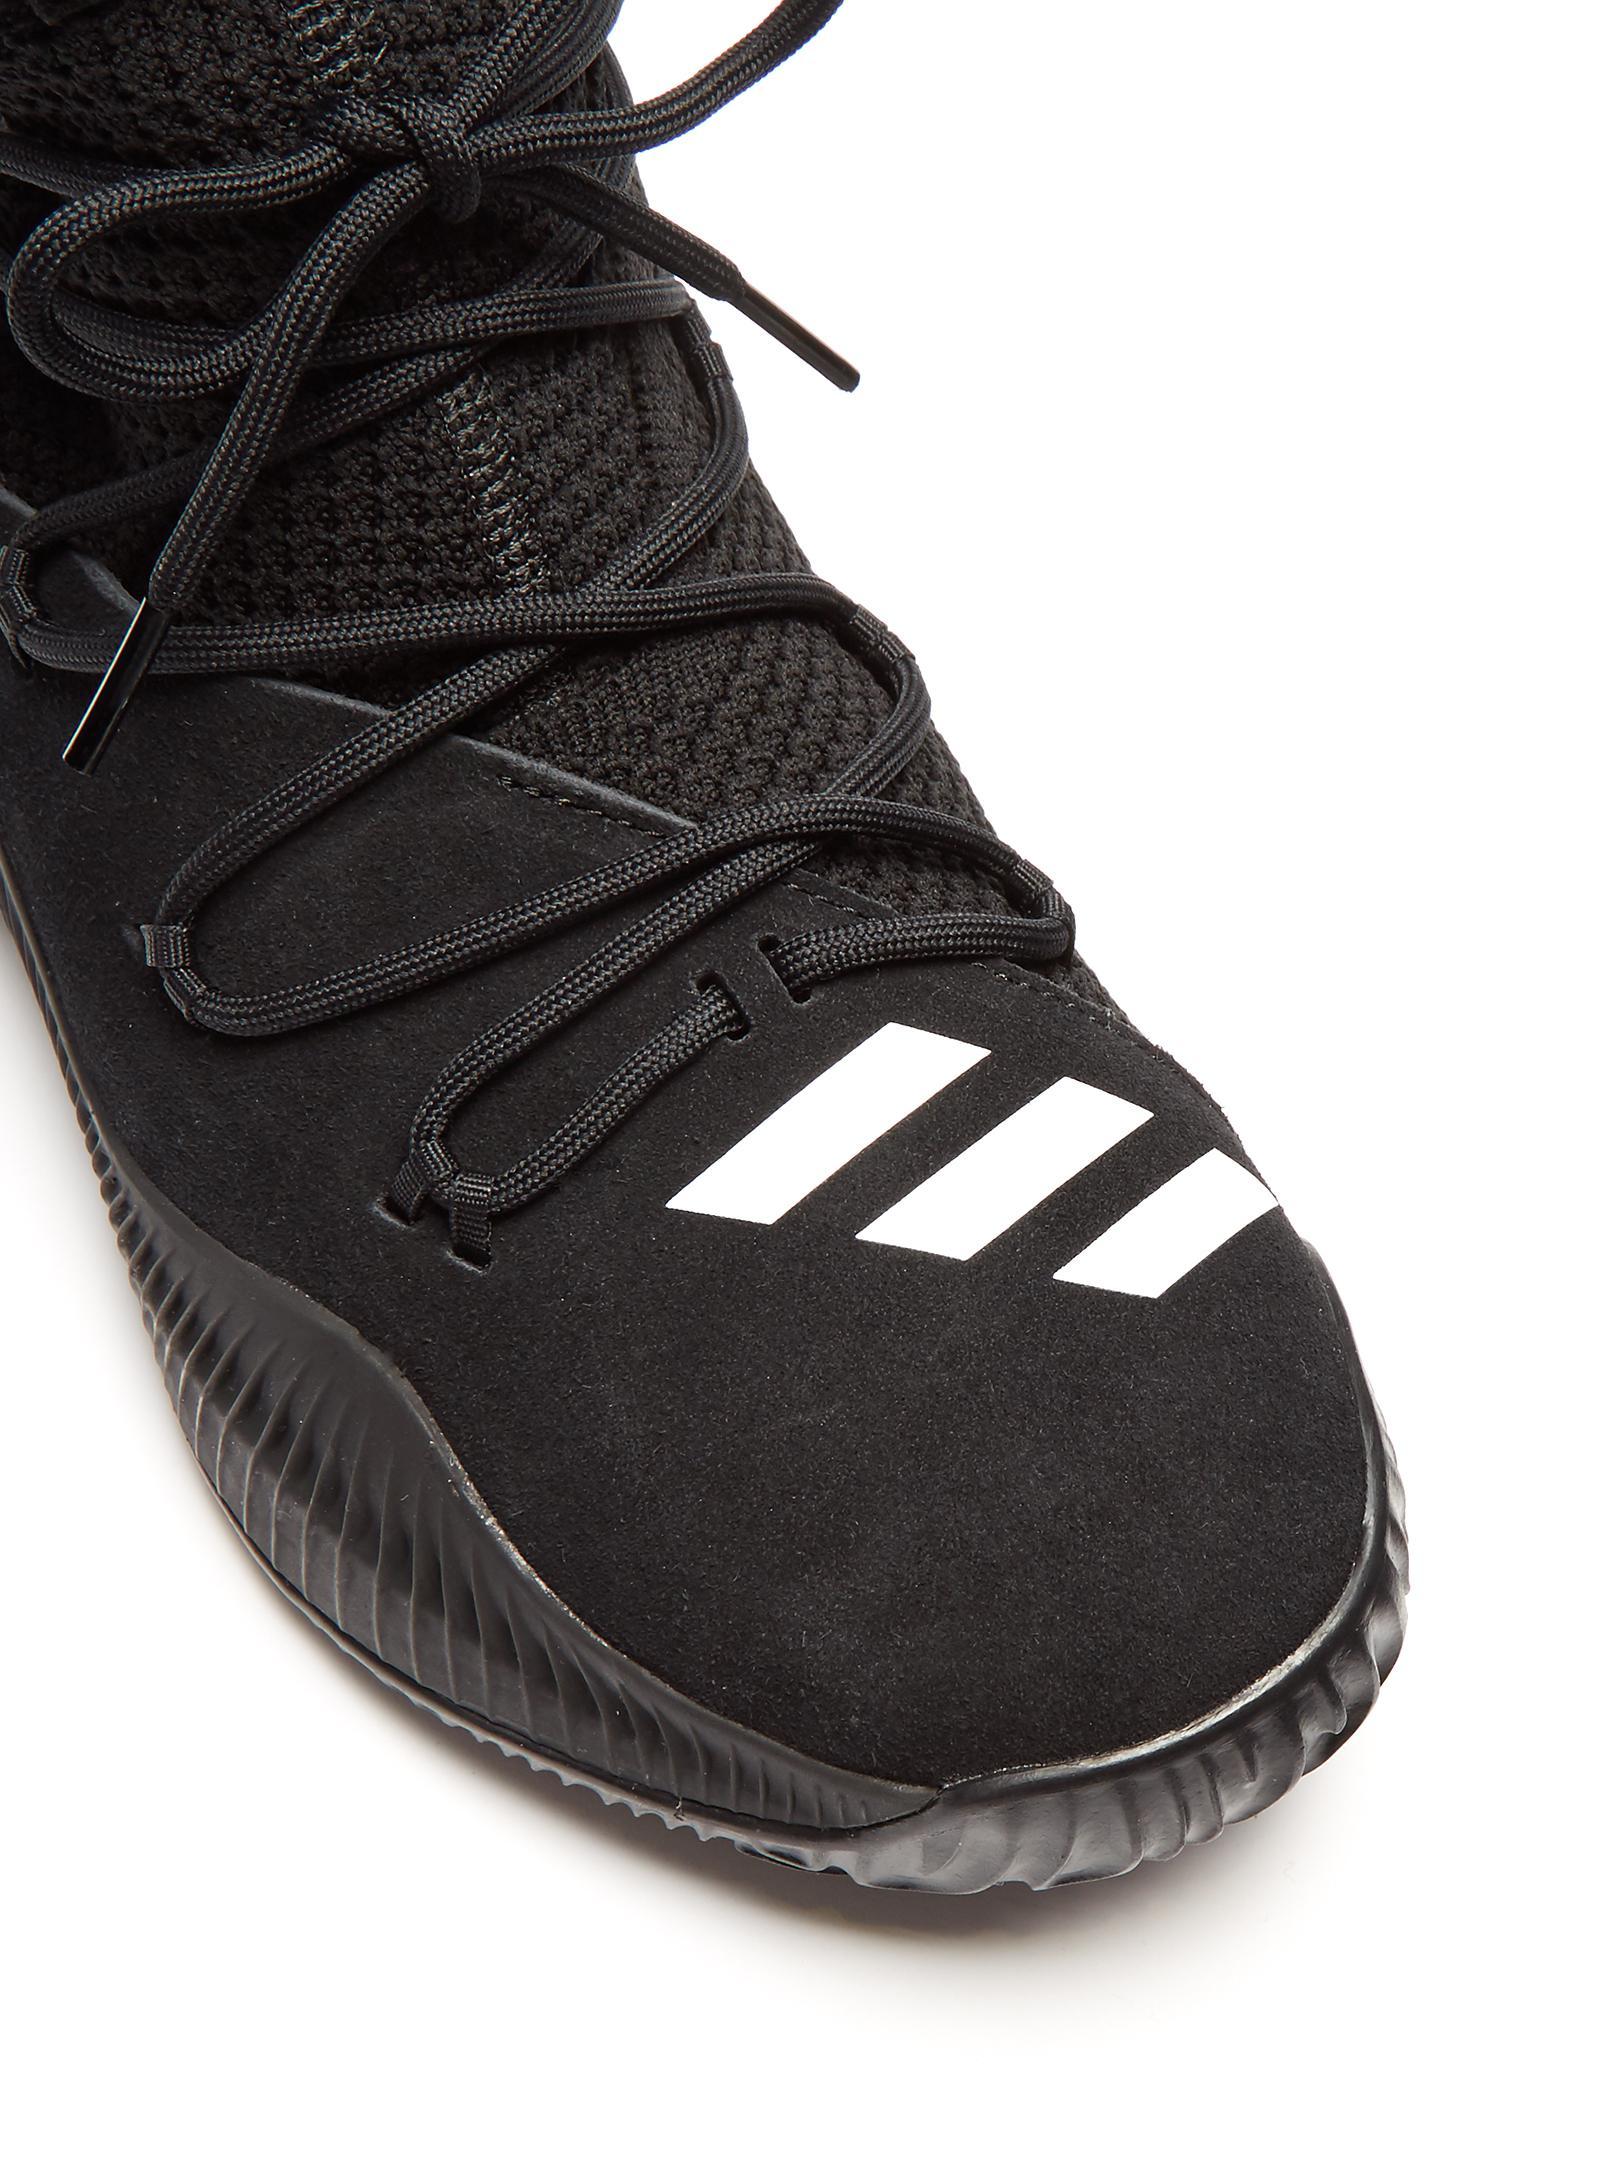 new product ba45b d56fa Lyst - adidas Originals Ado Crazy Explosive Low-top Trainers in ...